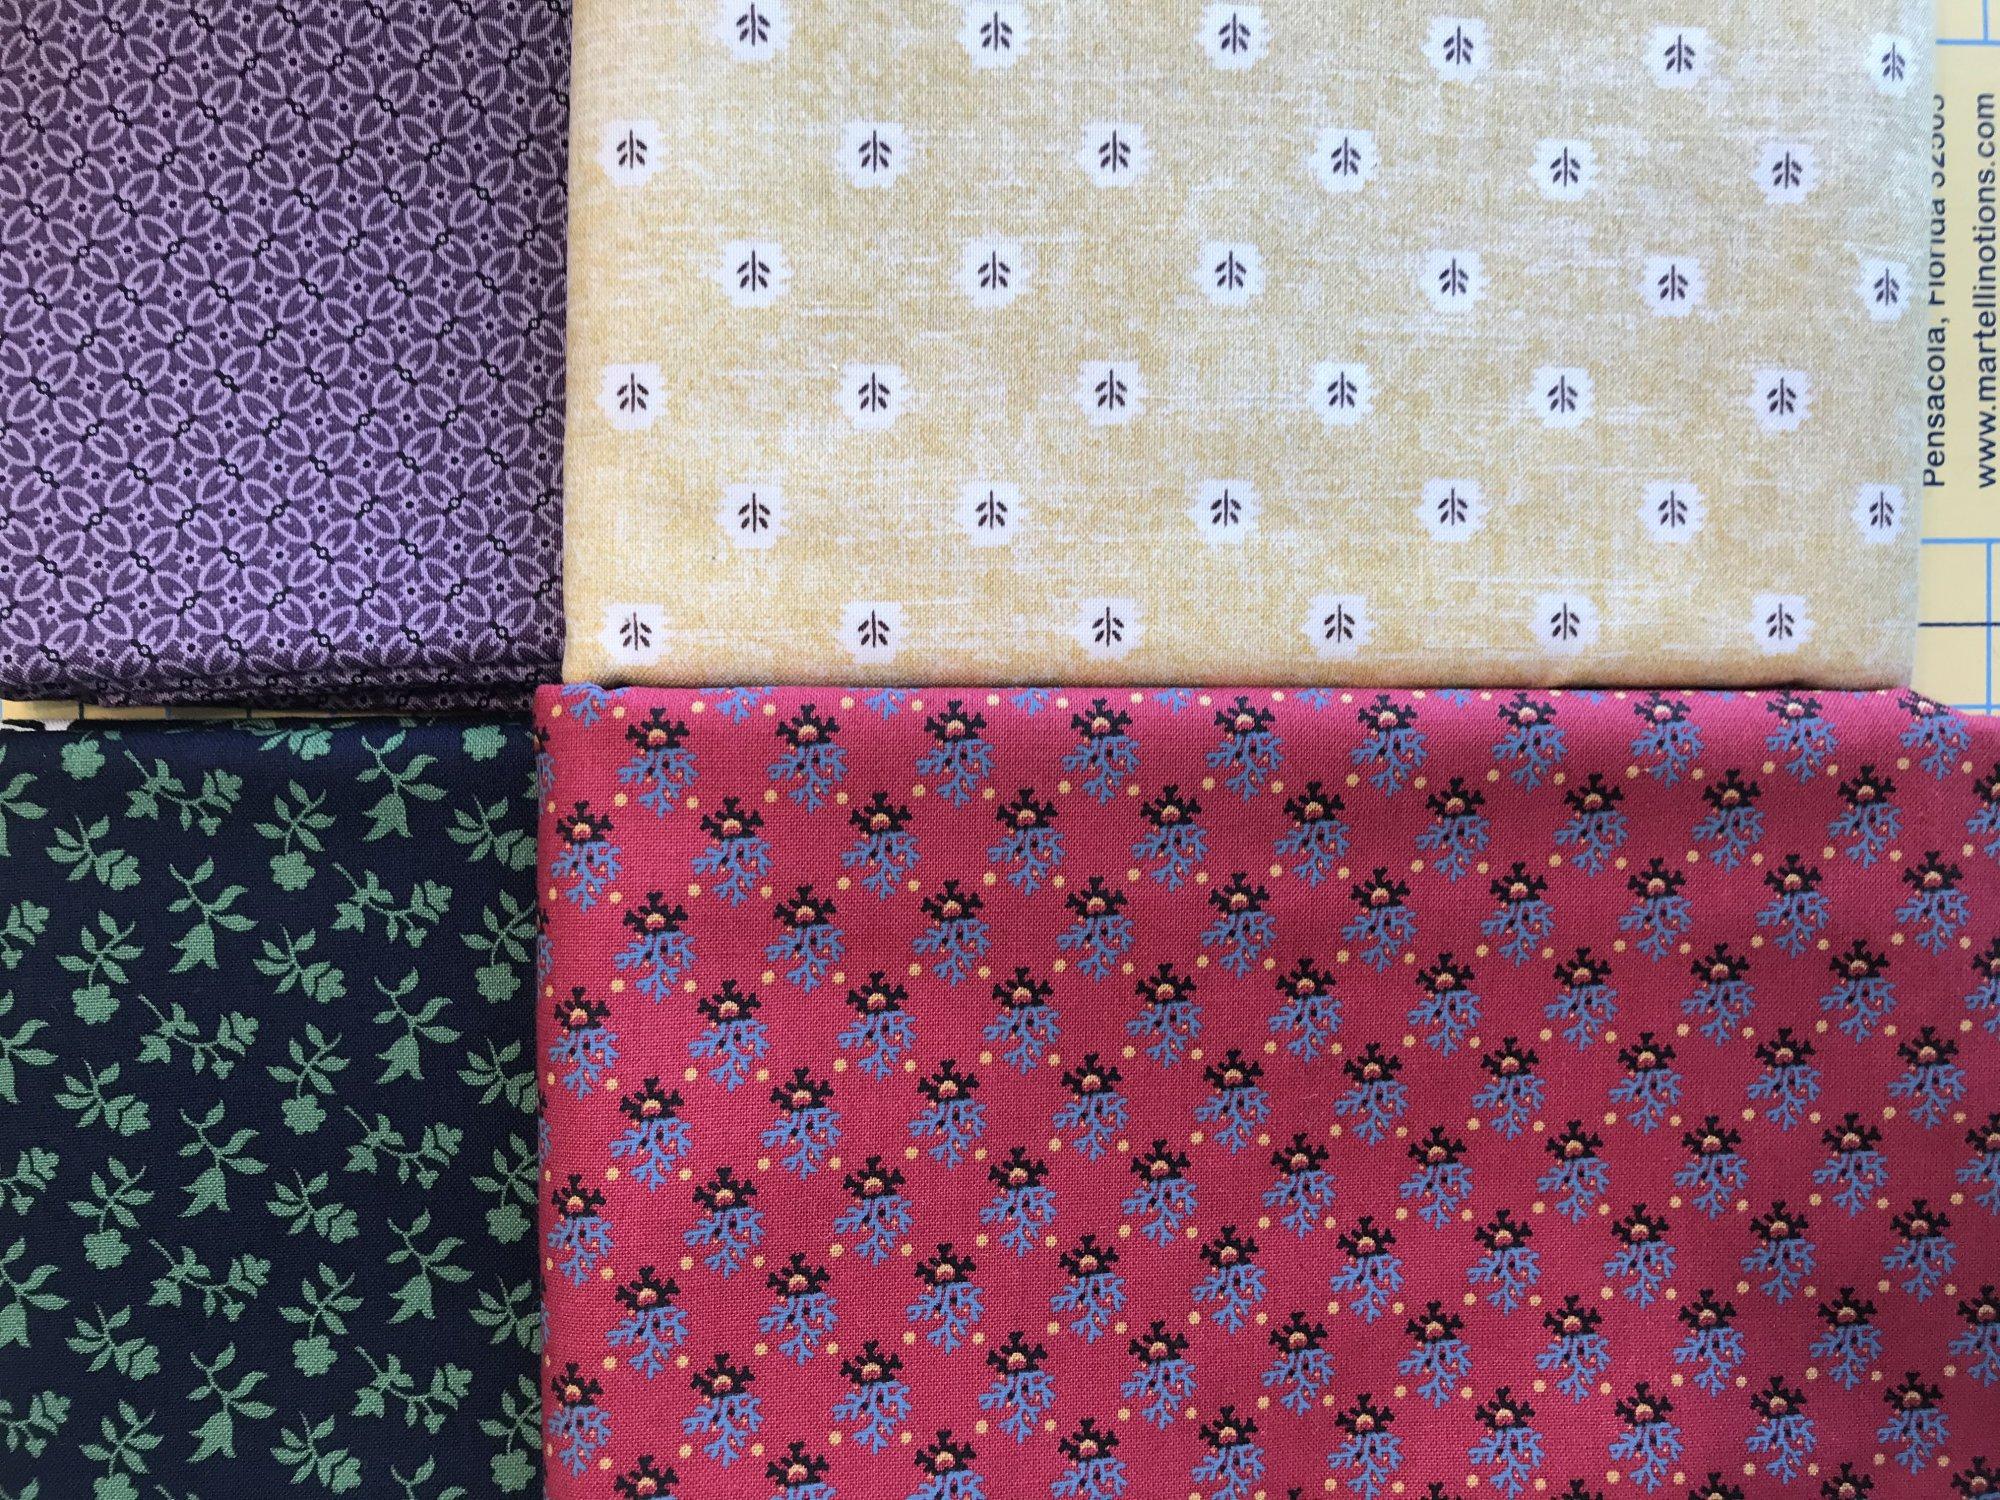 5-B 4 Marcus Fabrics One Yard Cuts